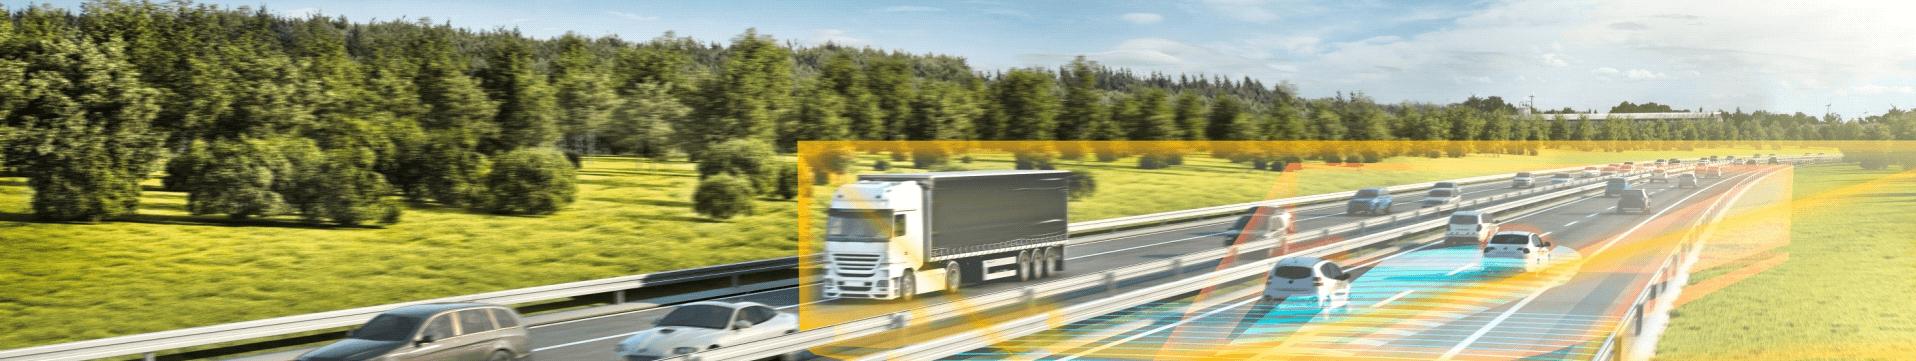 5G与智能网联汽车融合创新发展高级研修班2019- 长沙